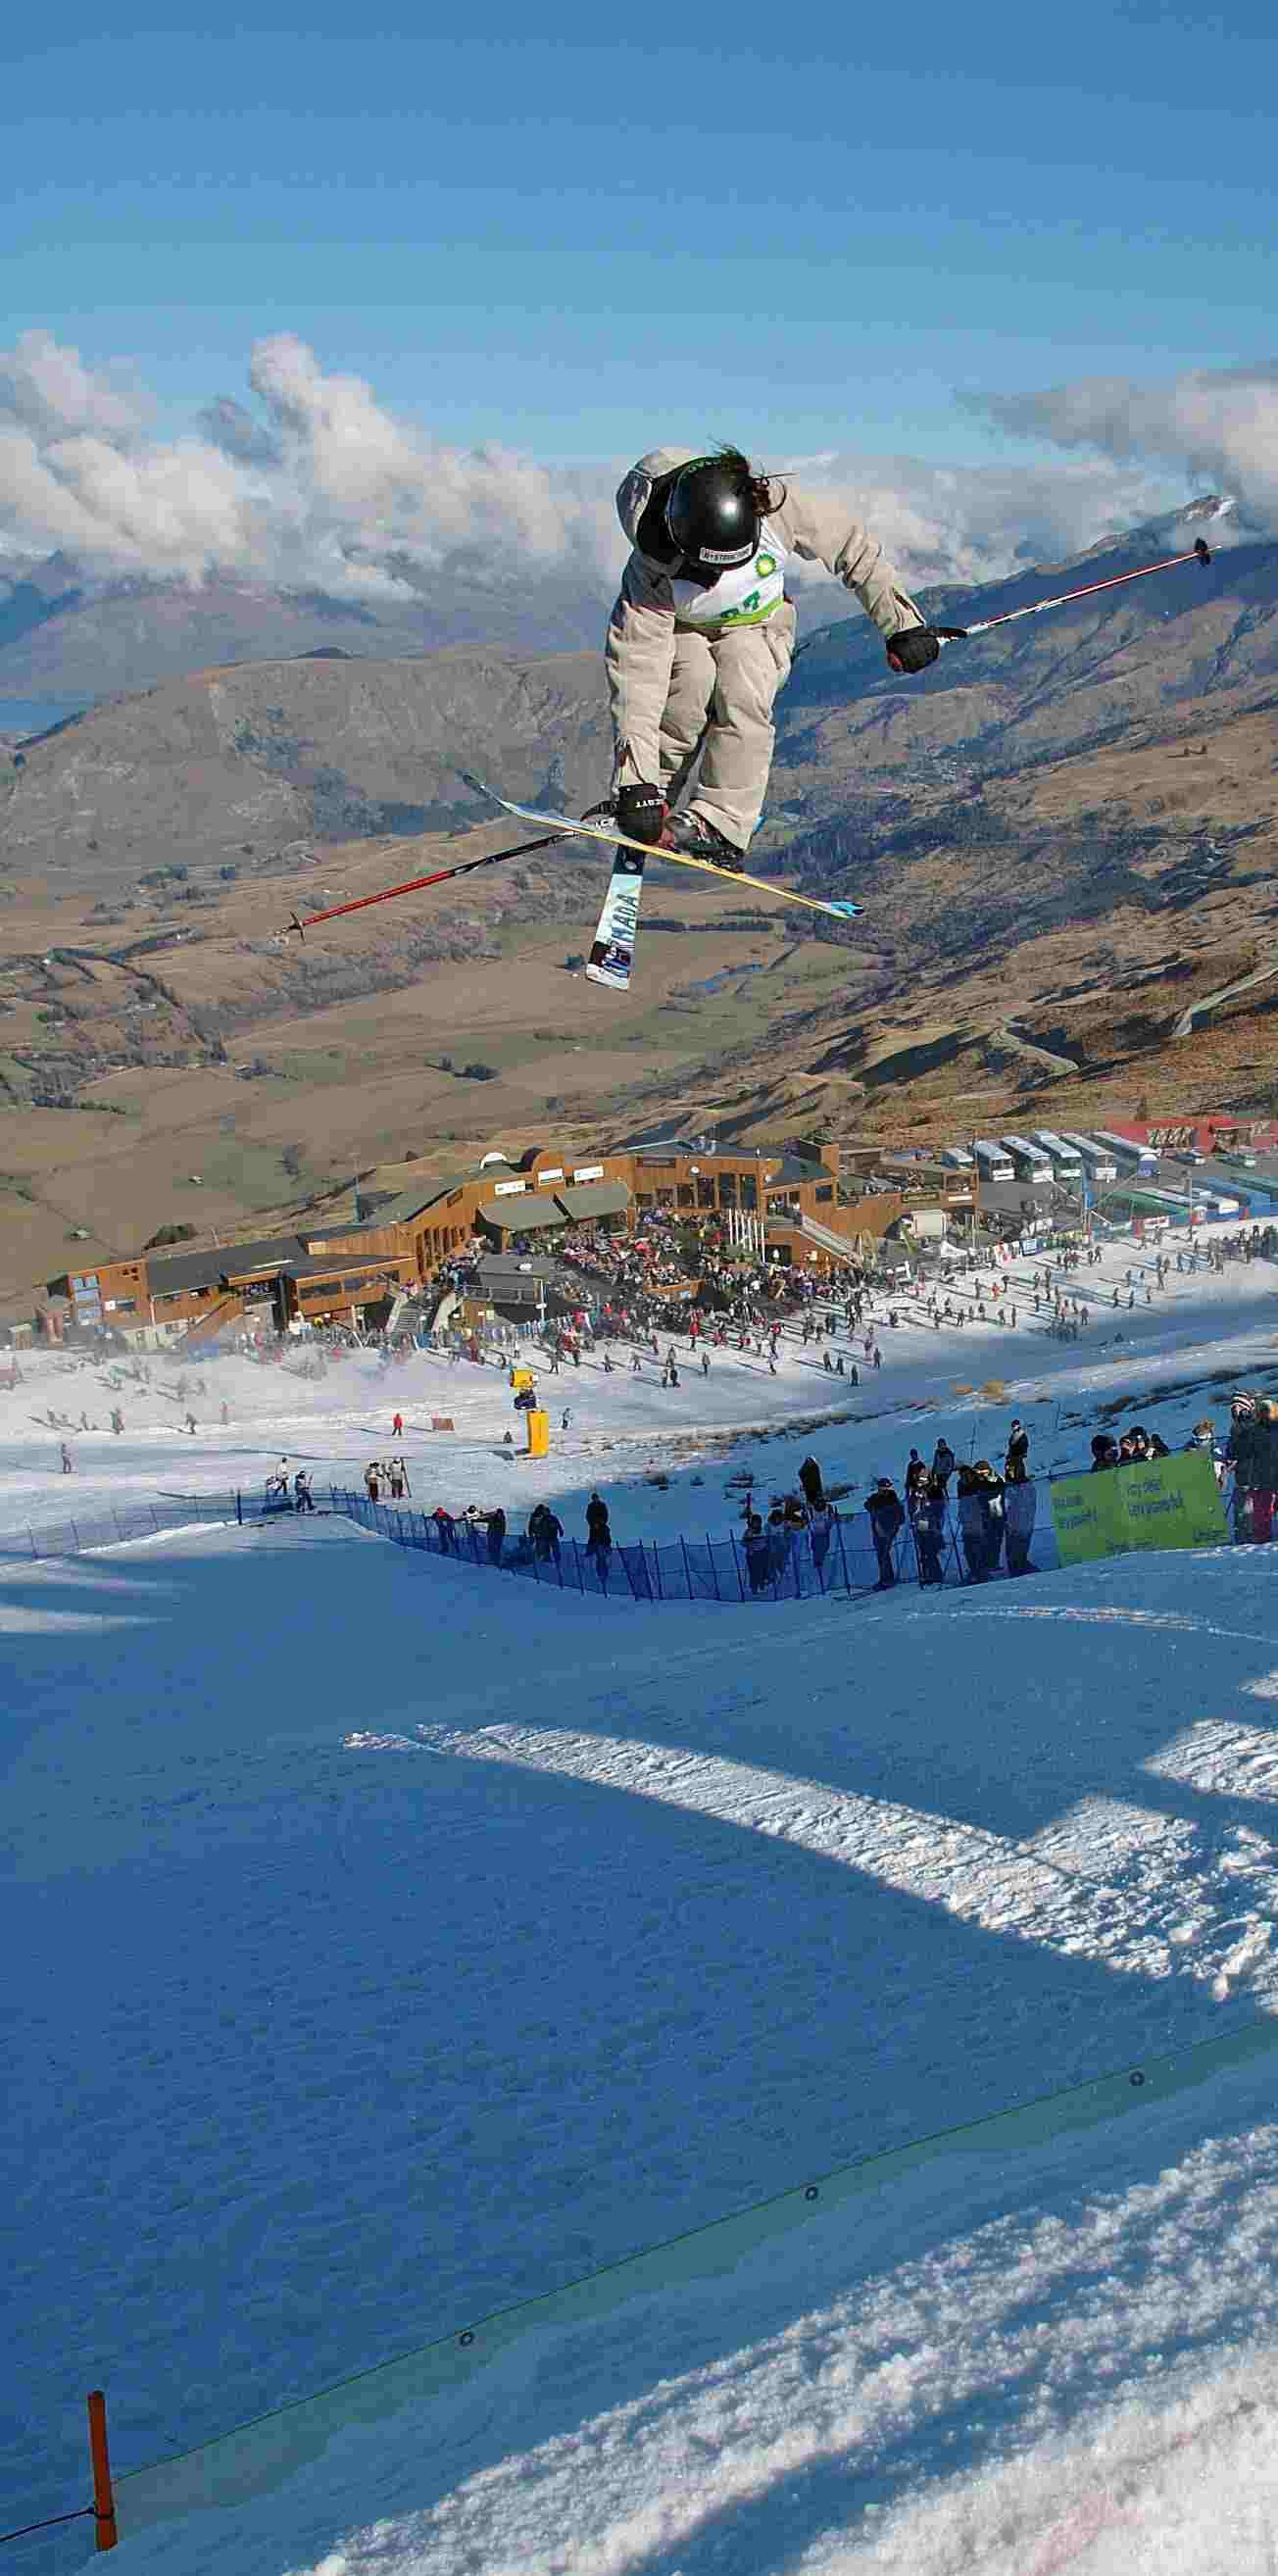 Coronet Peak Big Air Kim (picture cut alot)